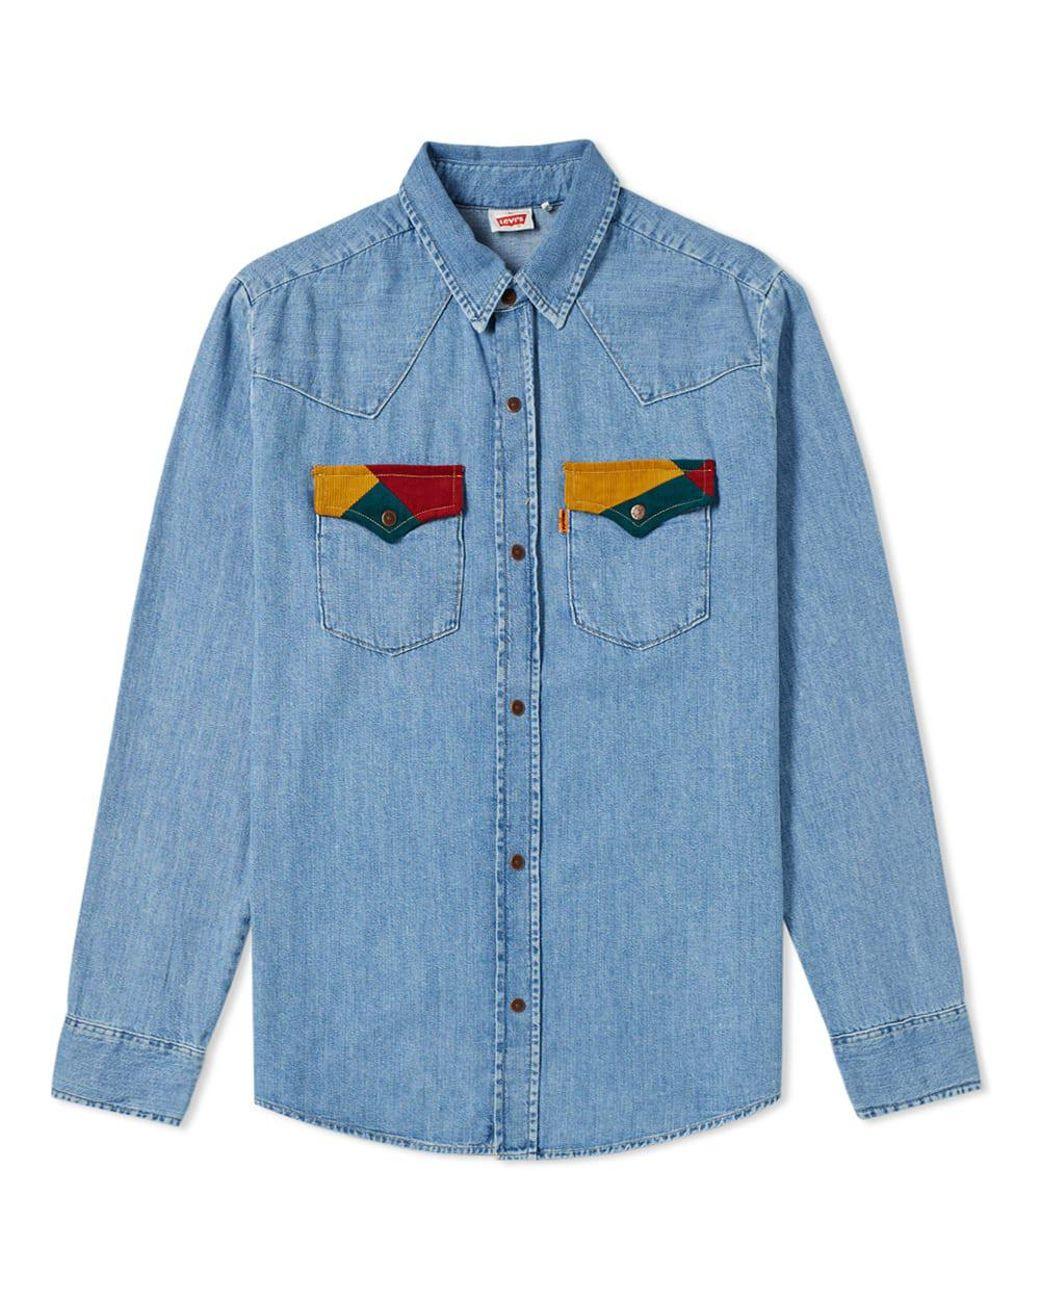 21e874e204 Lyst - Levi s Levi s Vintage Clothing 70 s Denim Shirt in Blue for ...